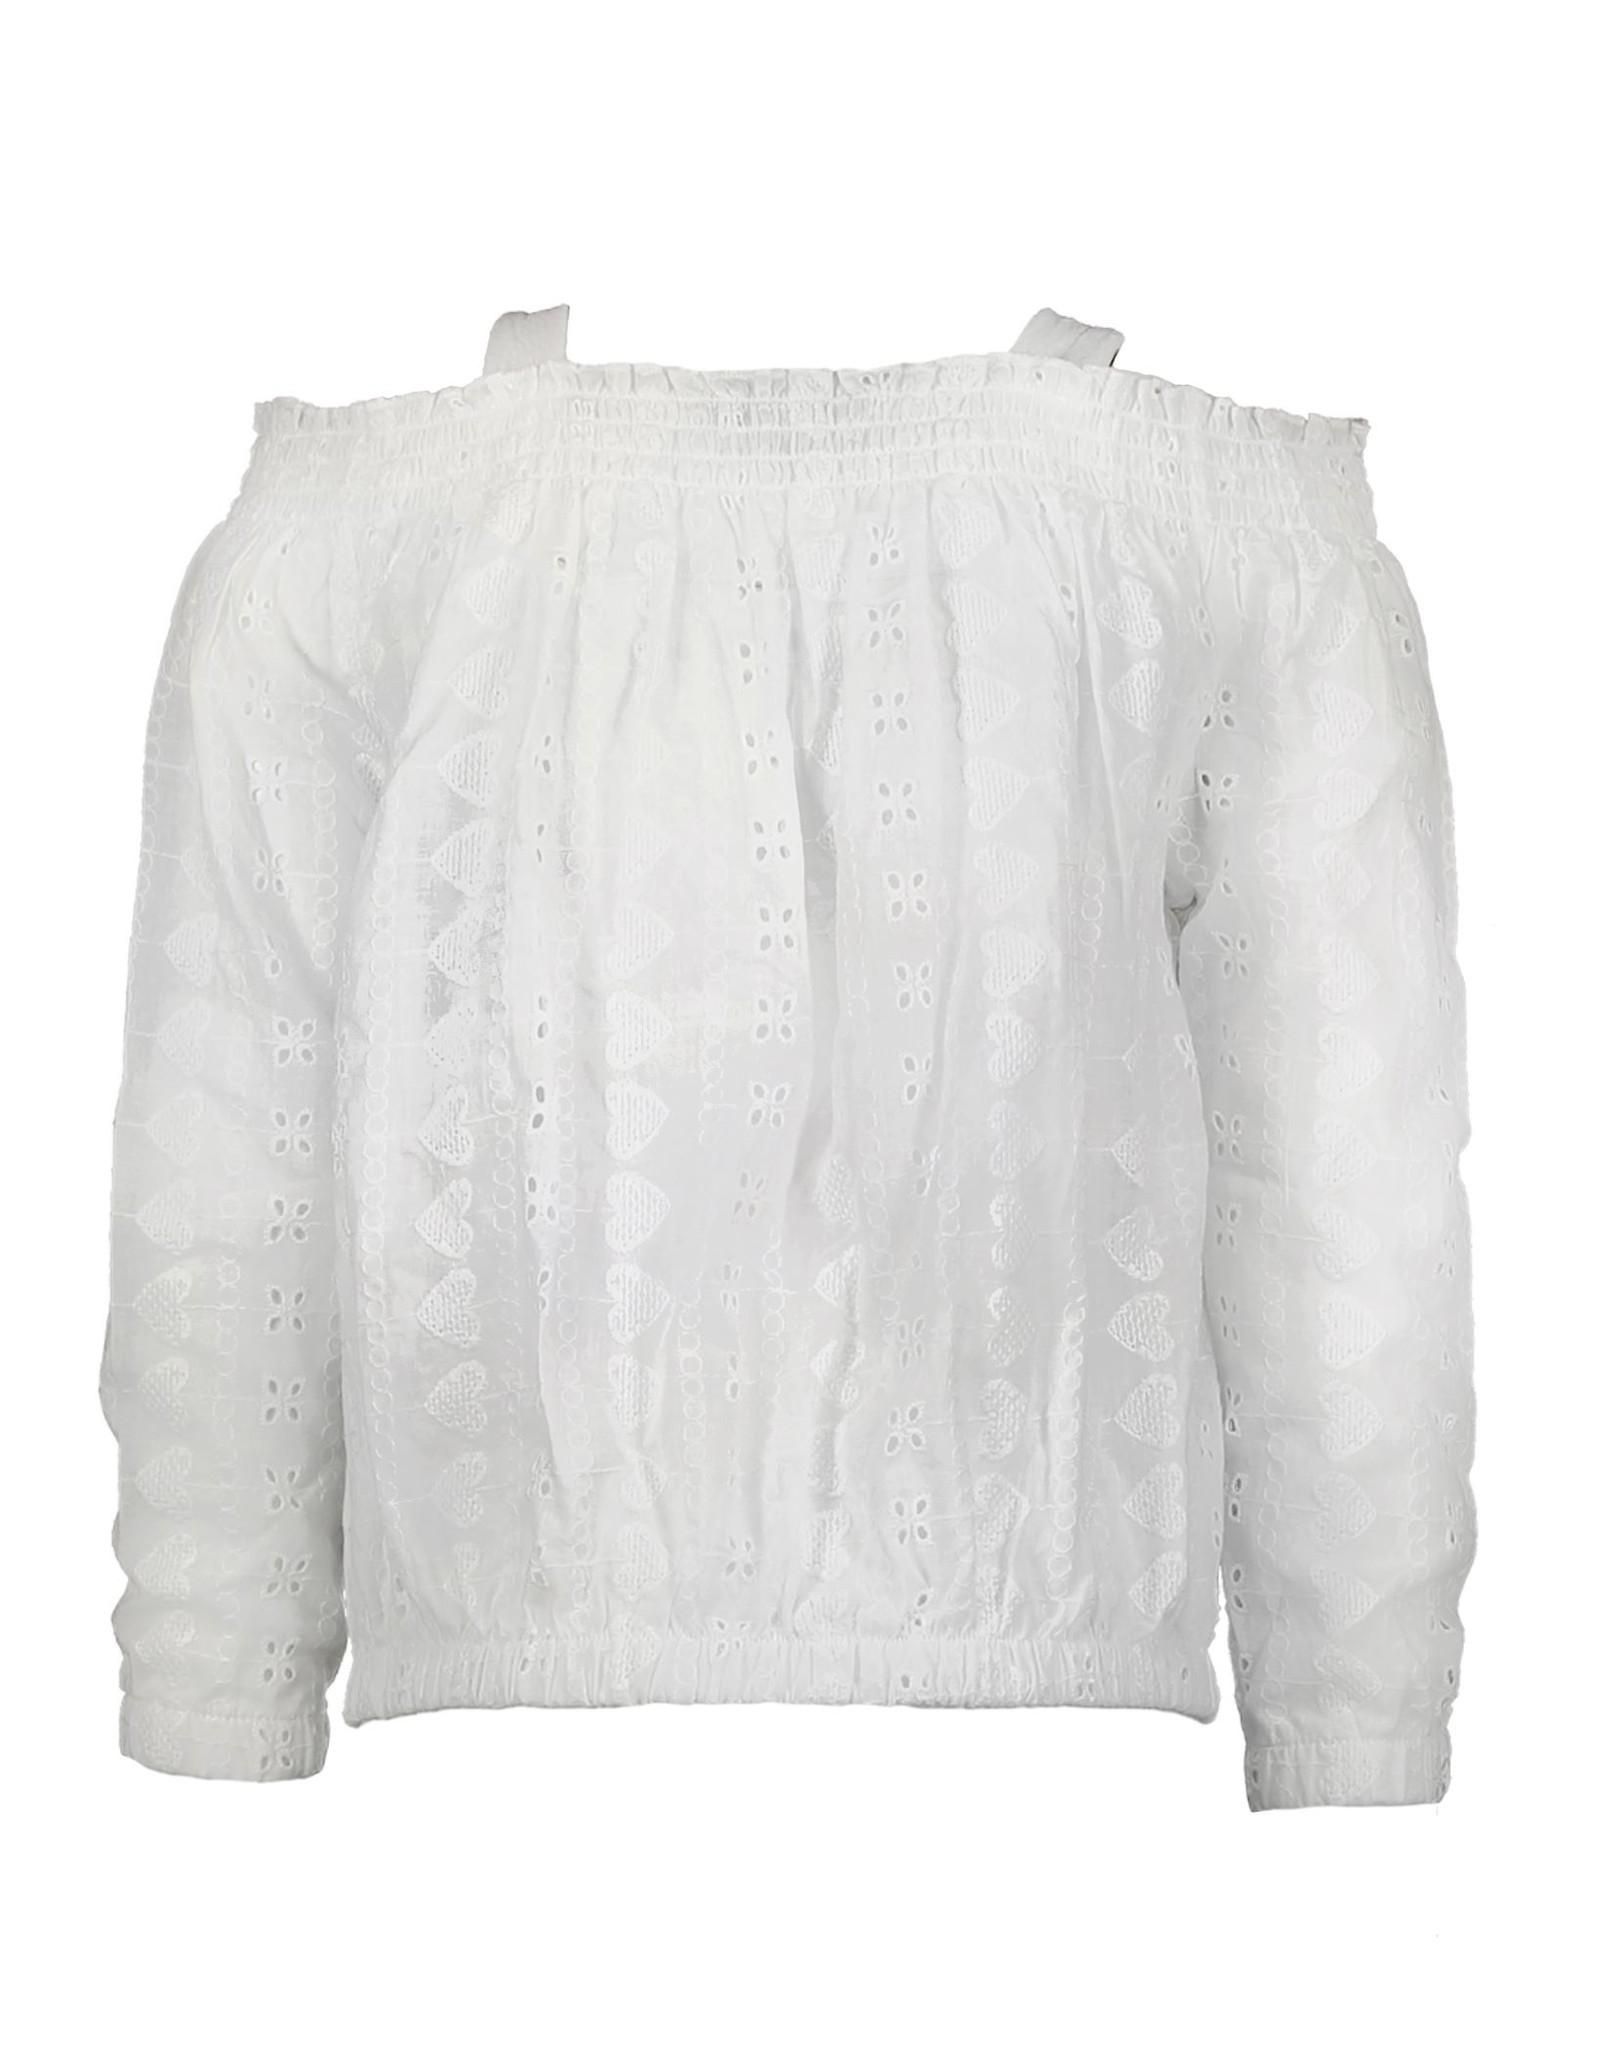 Moodstreet Moodstreet blouse 5120  broderie warm white